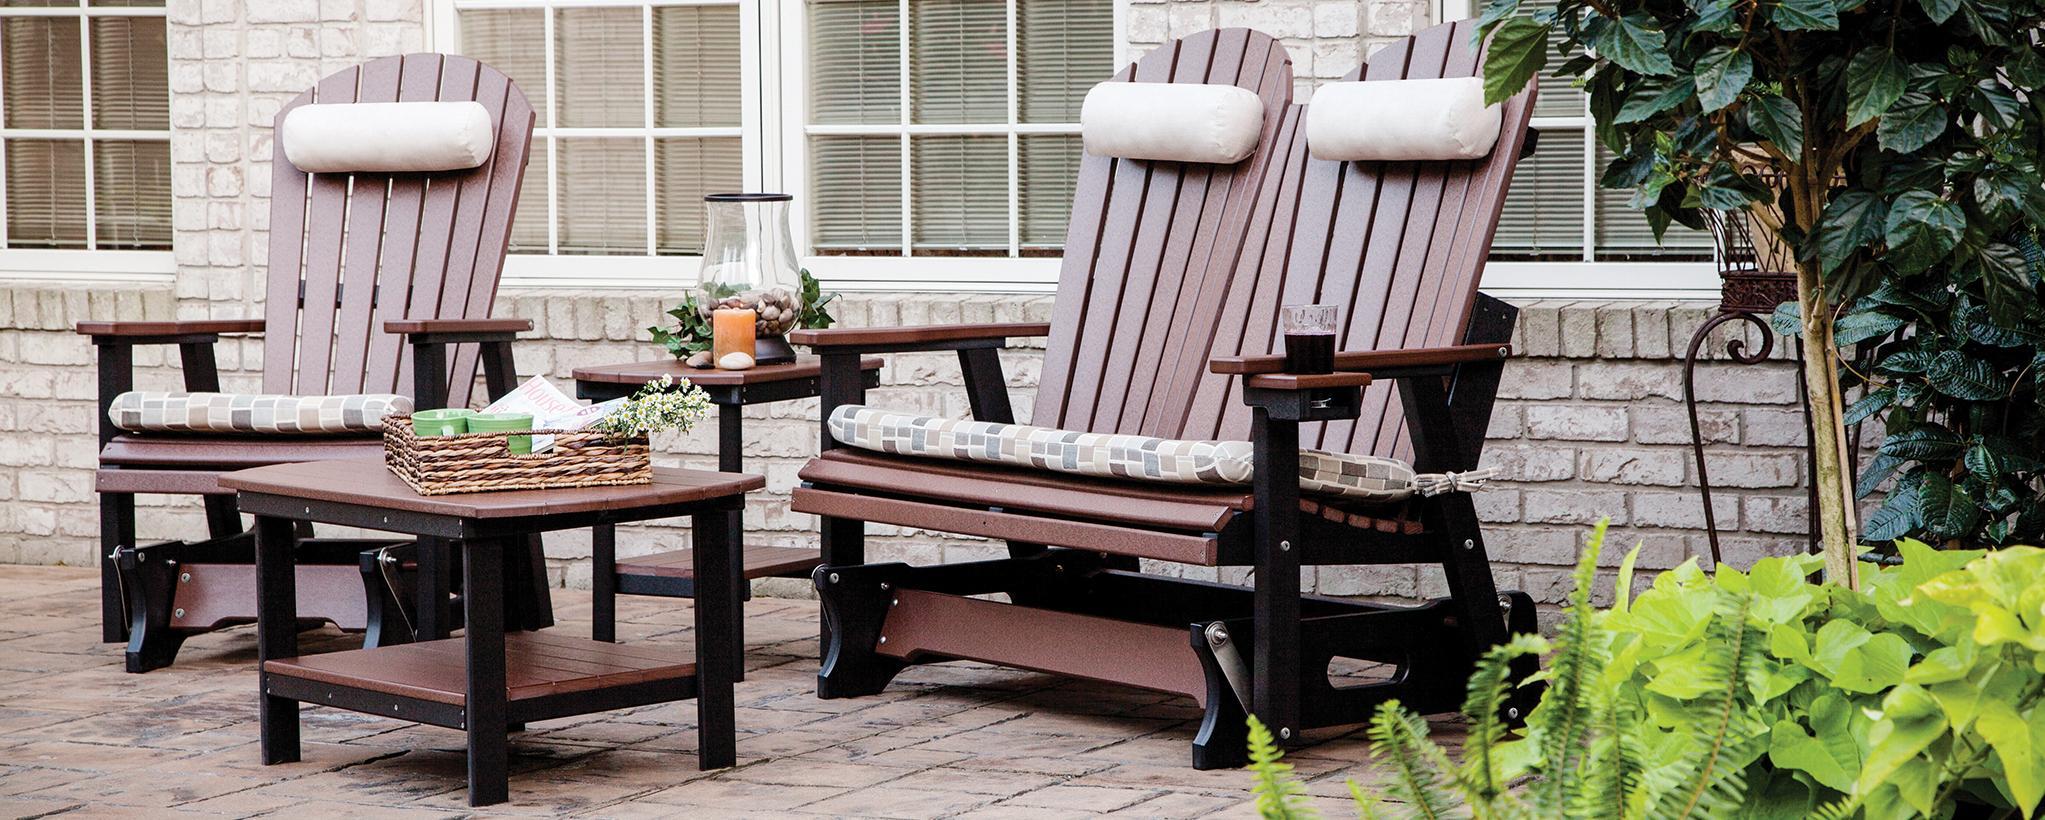 Cabinets Outdoor Furniture Indoor Furniture • Nashville TN